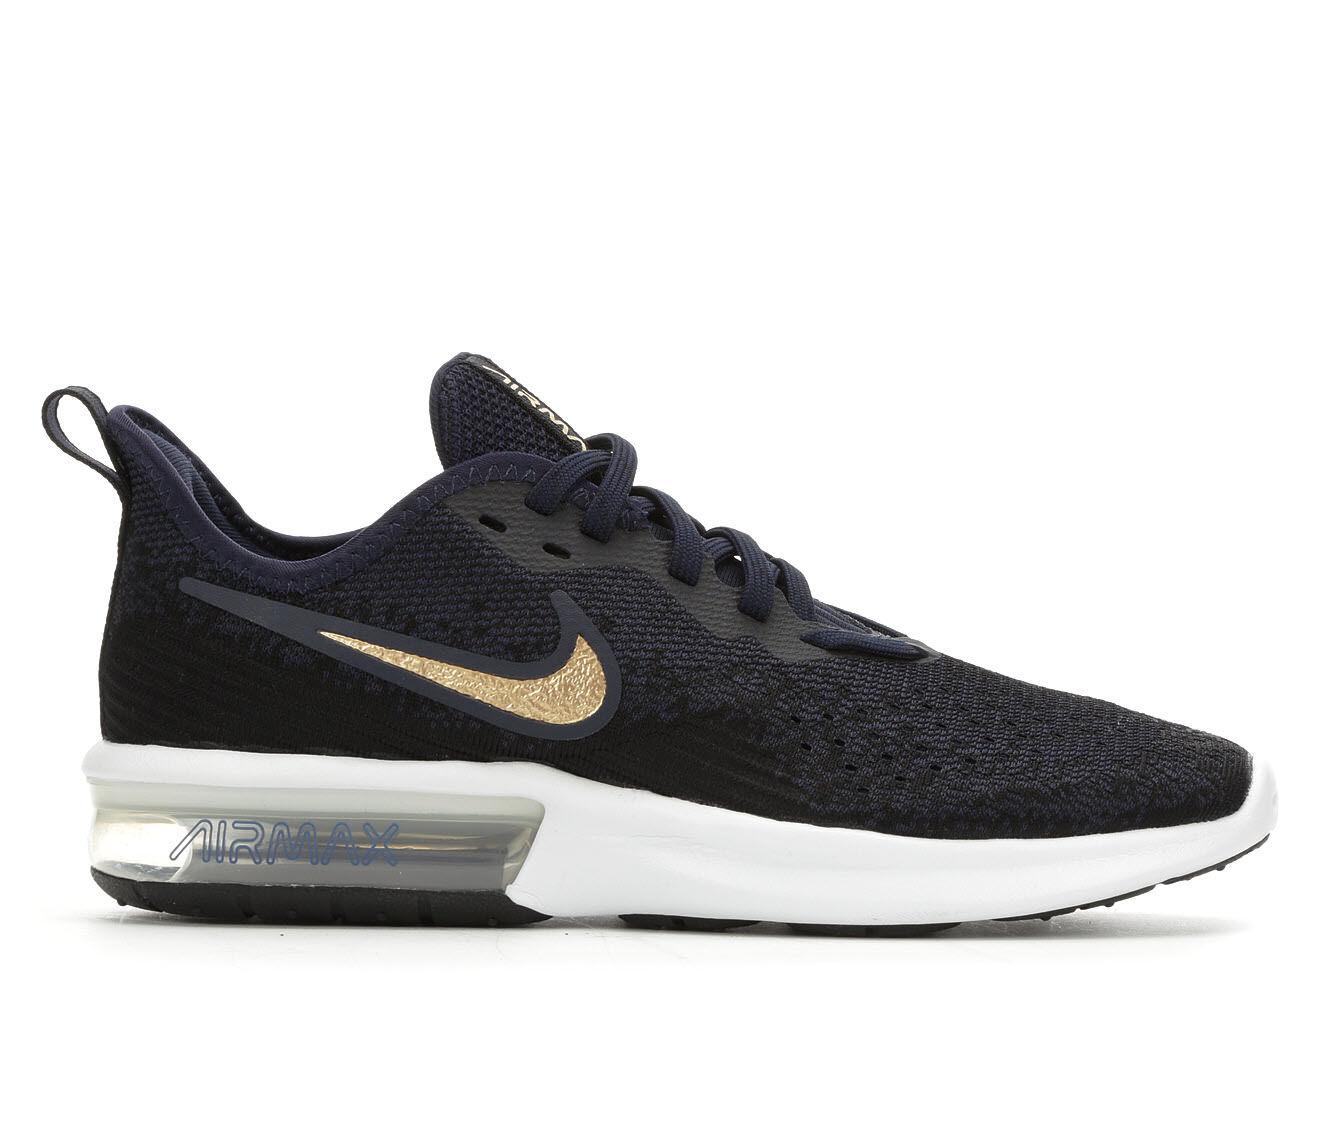 huge selection of a499b 25616 Womens Nike Free 5.0 V4 Olive Nike Womens Cheetah Print Shoe